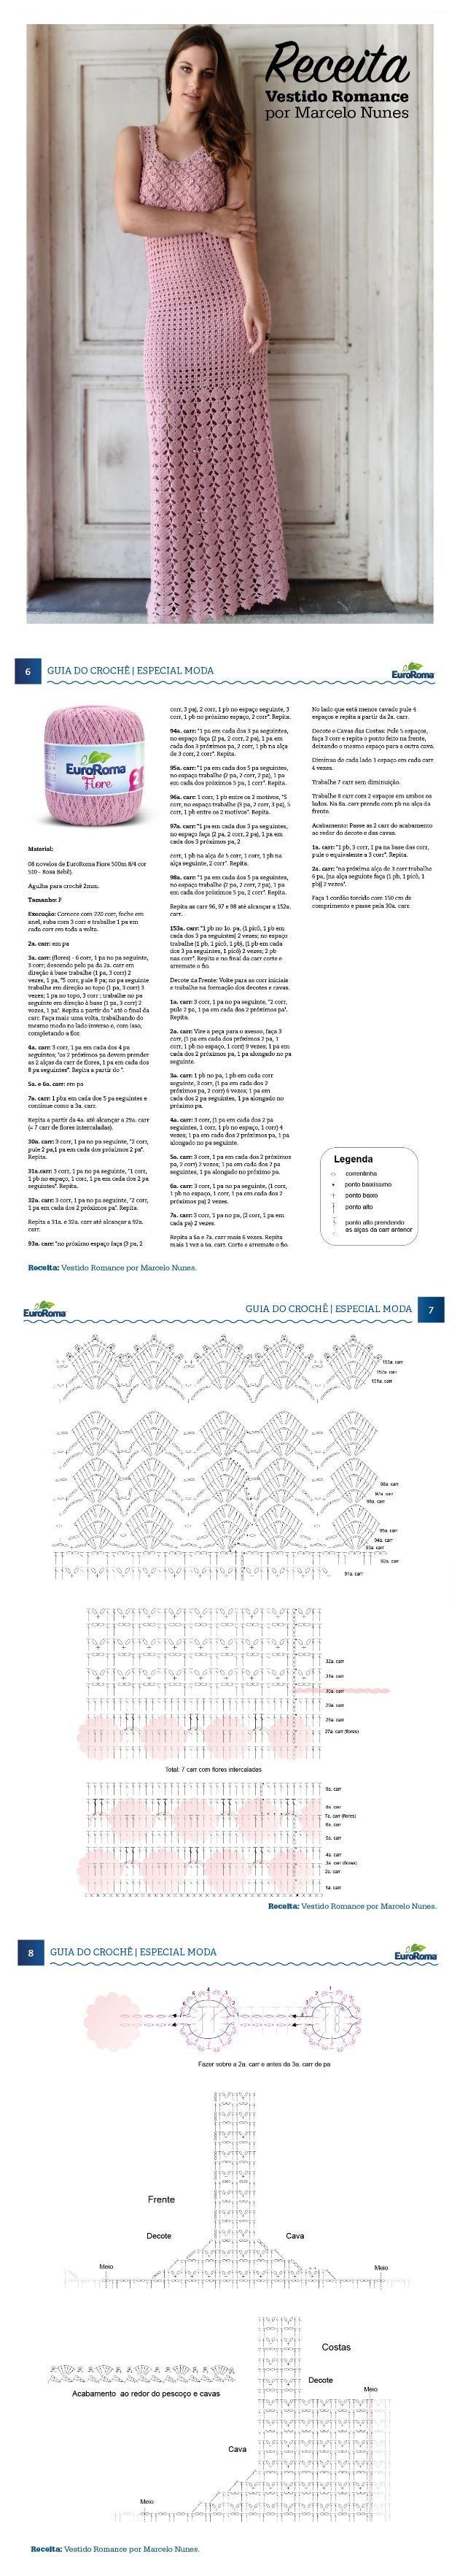 Guia do do Crochê - Moda Especial. Vestido Romance, por Marcelo Nunes - Fio EuroRoma Fiore 500m 8/4, na cor 510 (Rosa Bebê).